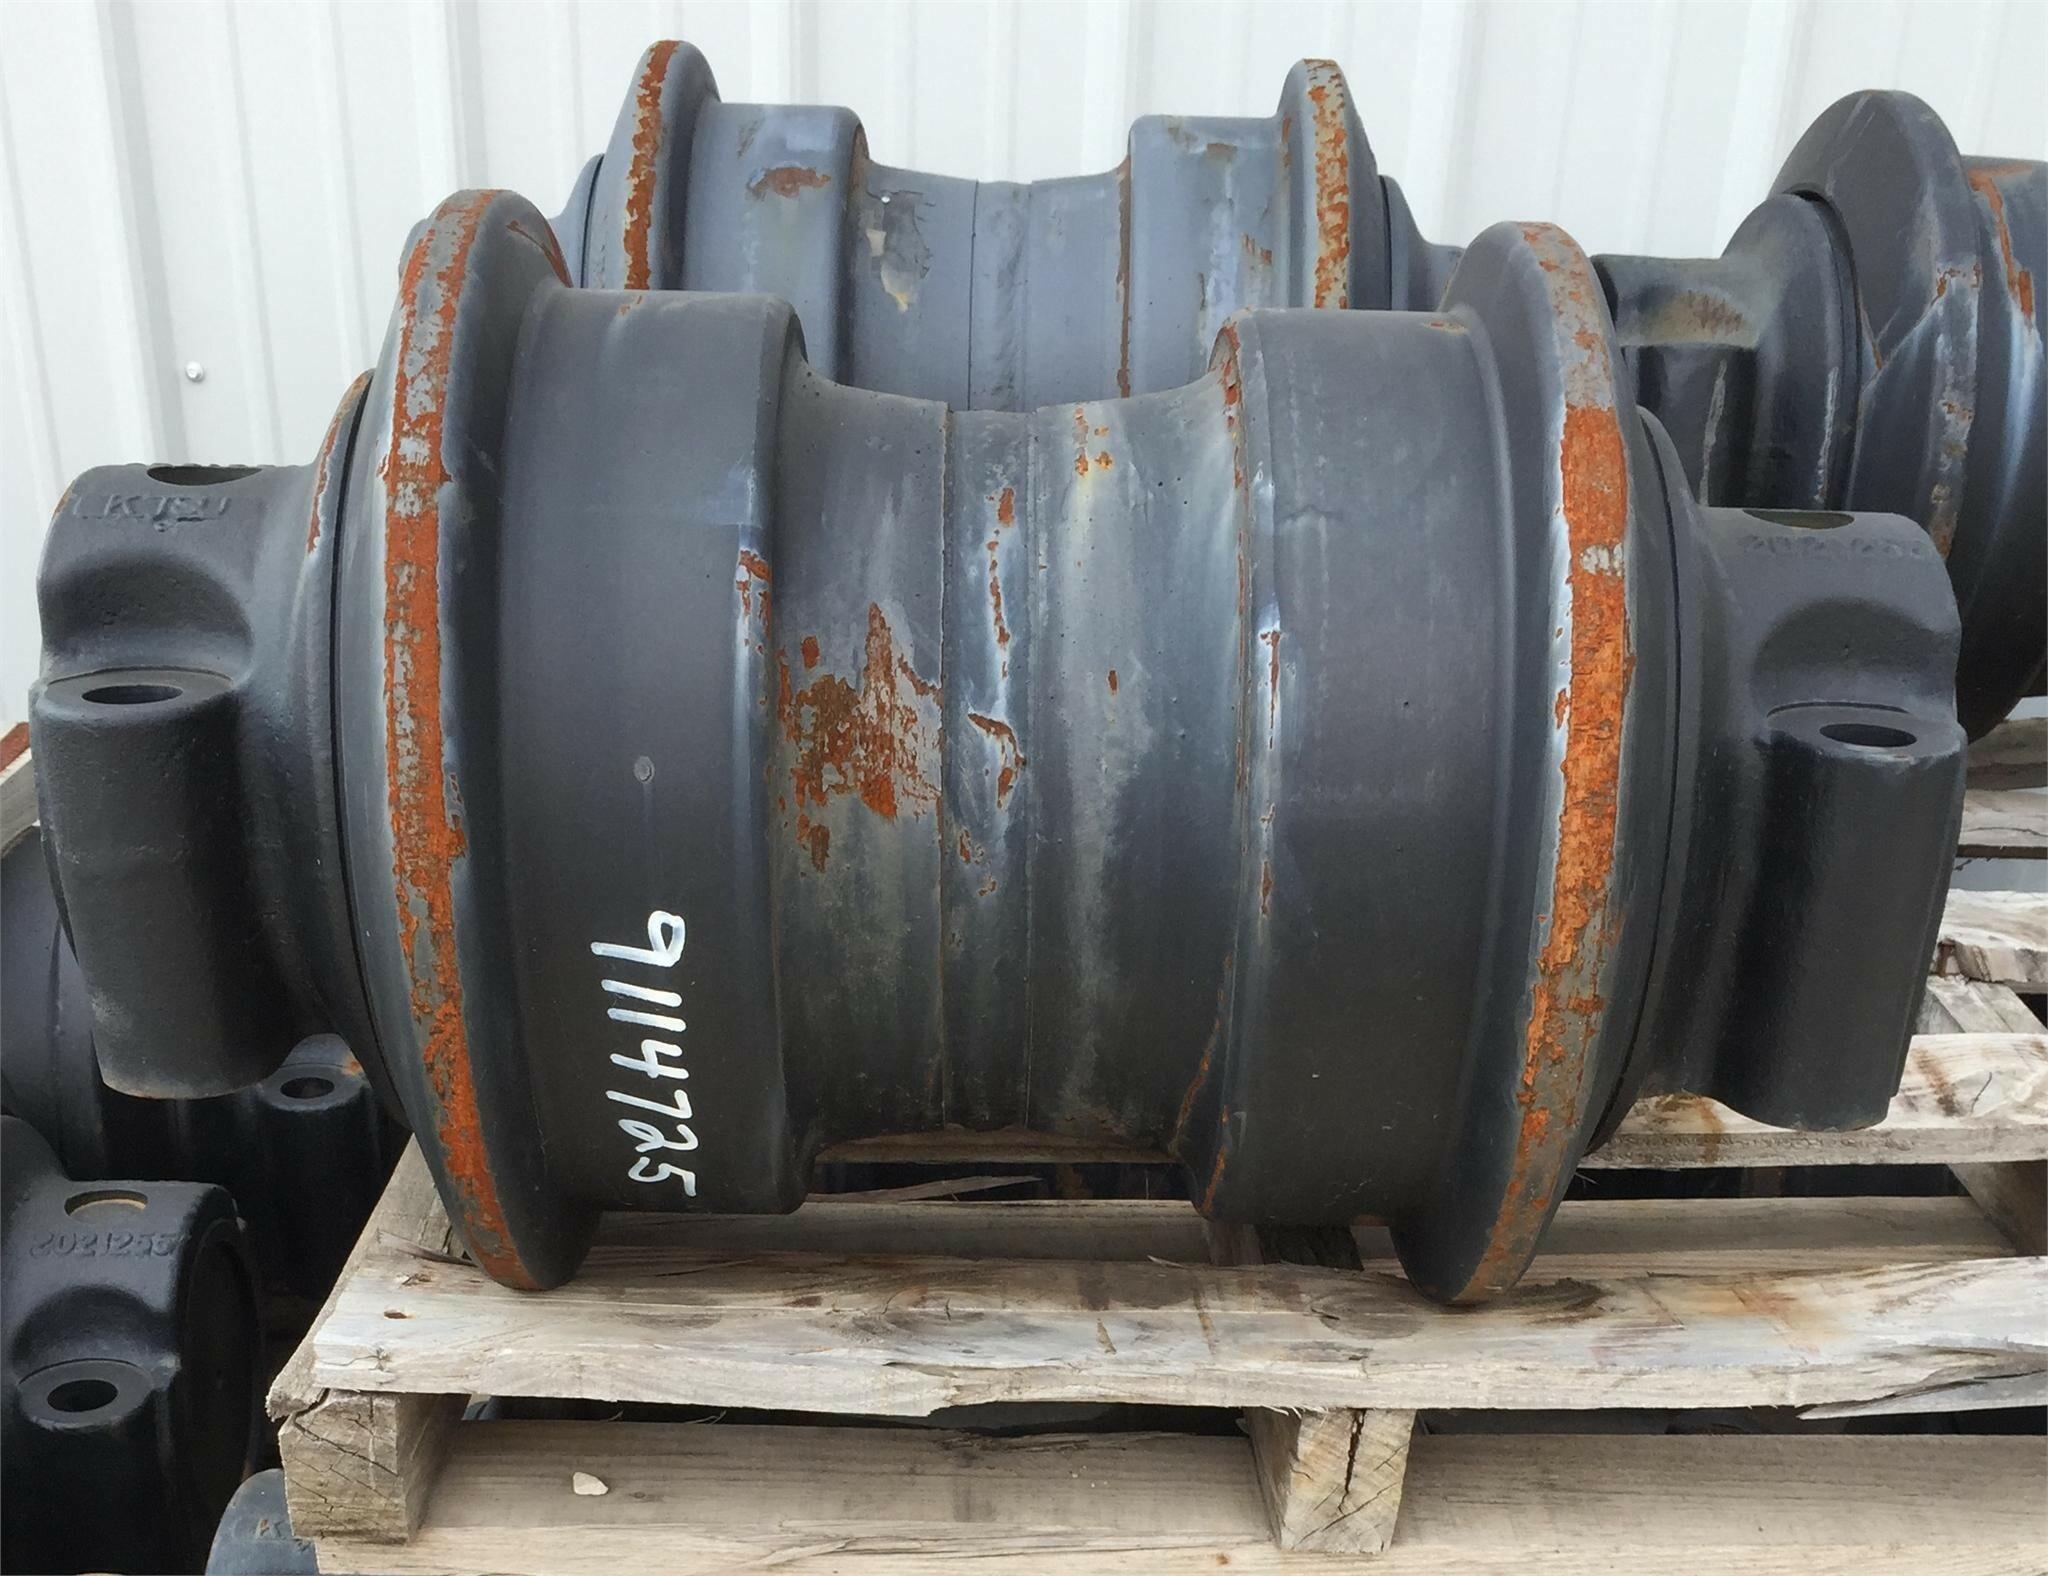 Kensetsu 9114725 Wheels / Tires / Track